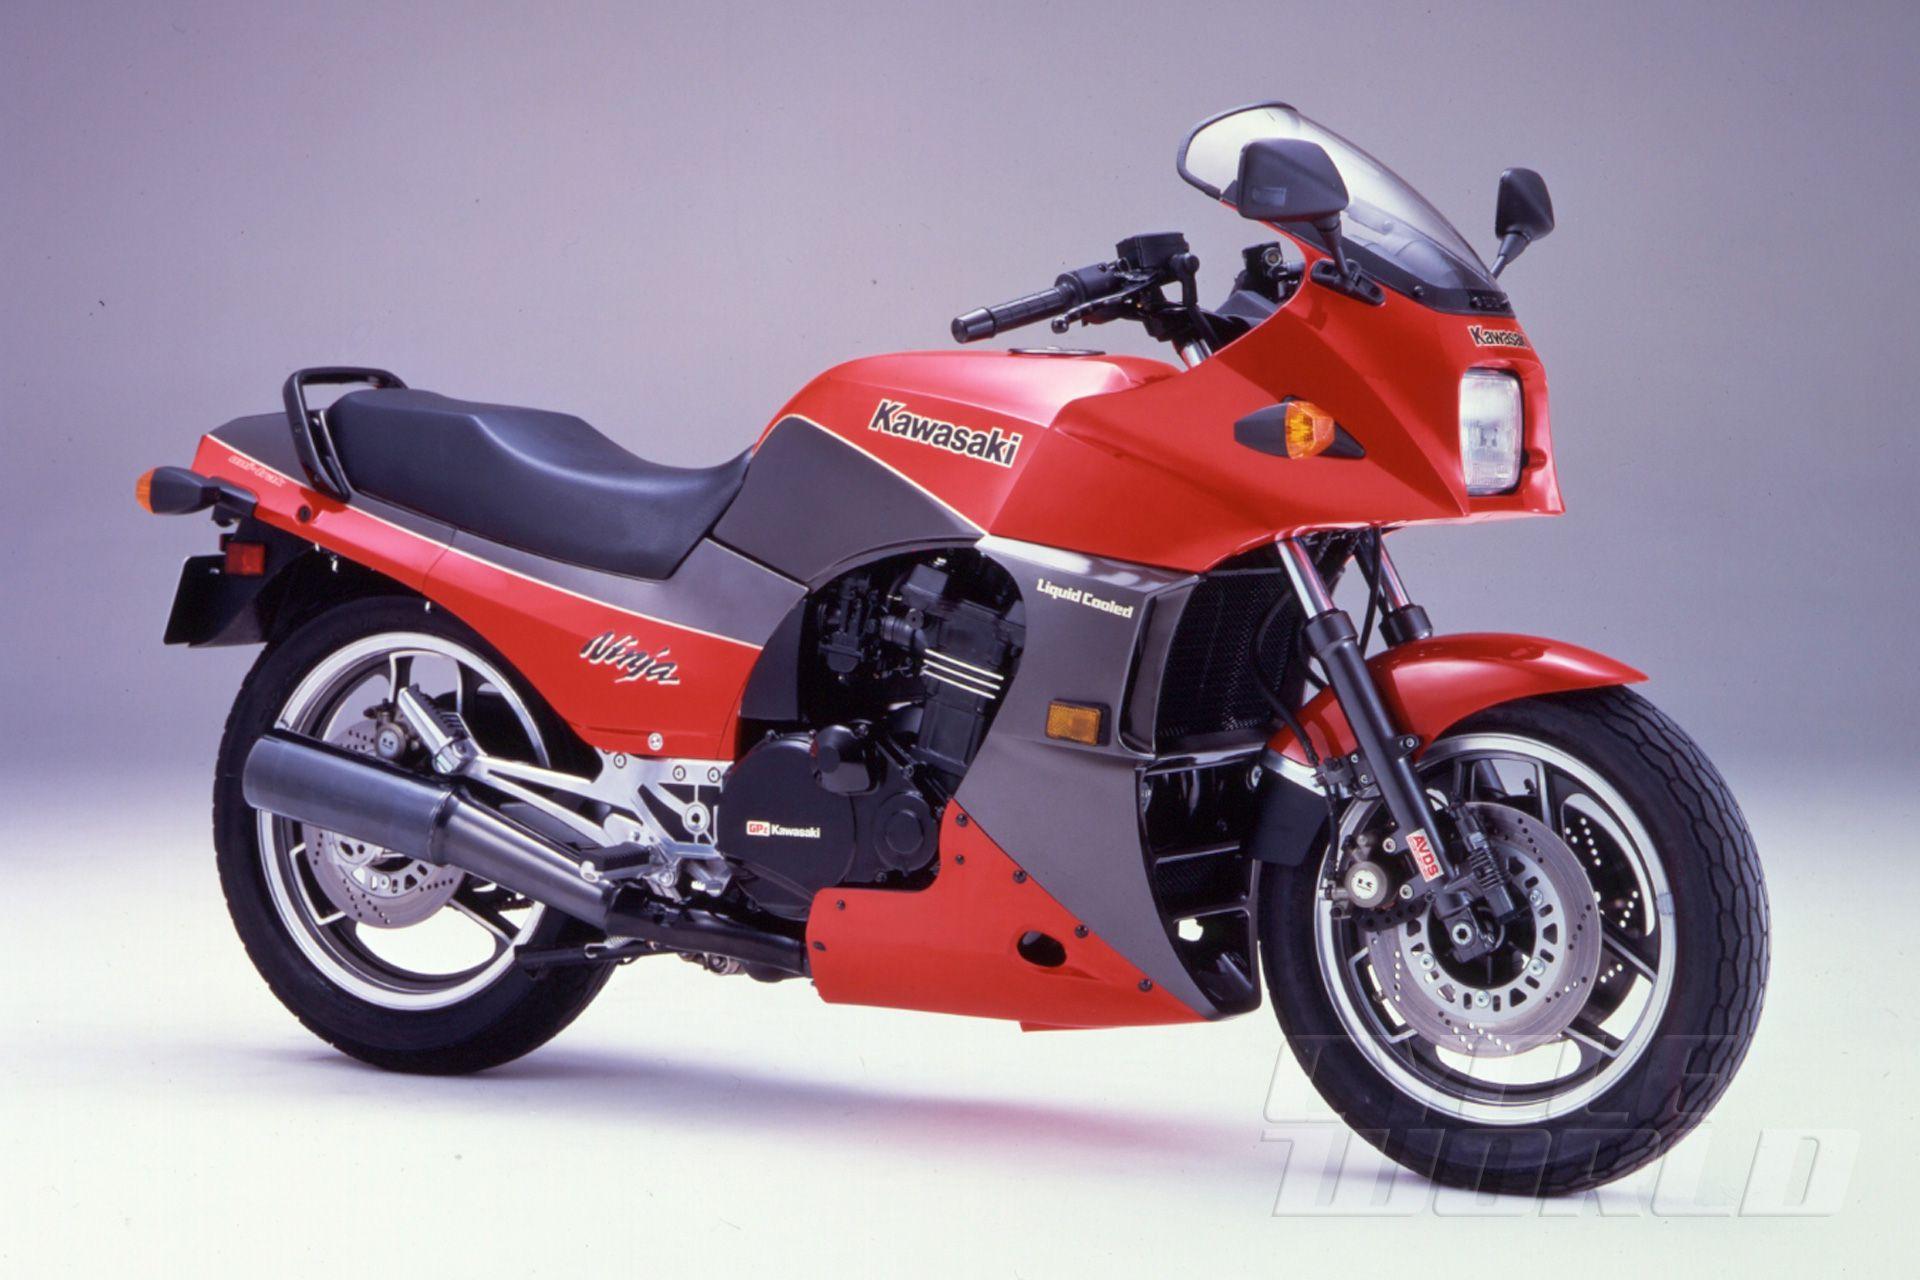 hight resolution of 30 years of ninjas 1984 gpz900 ninja to 1990 zx 11